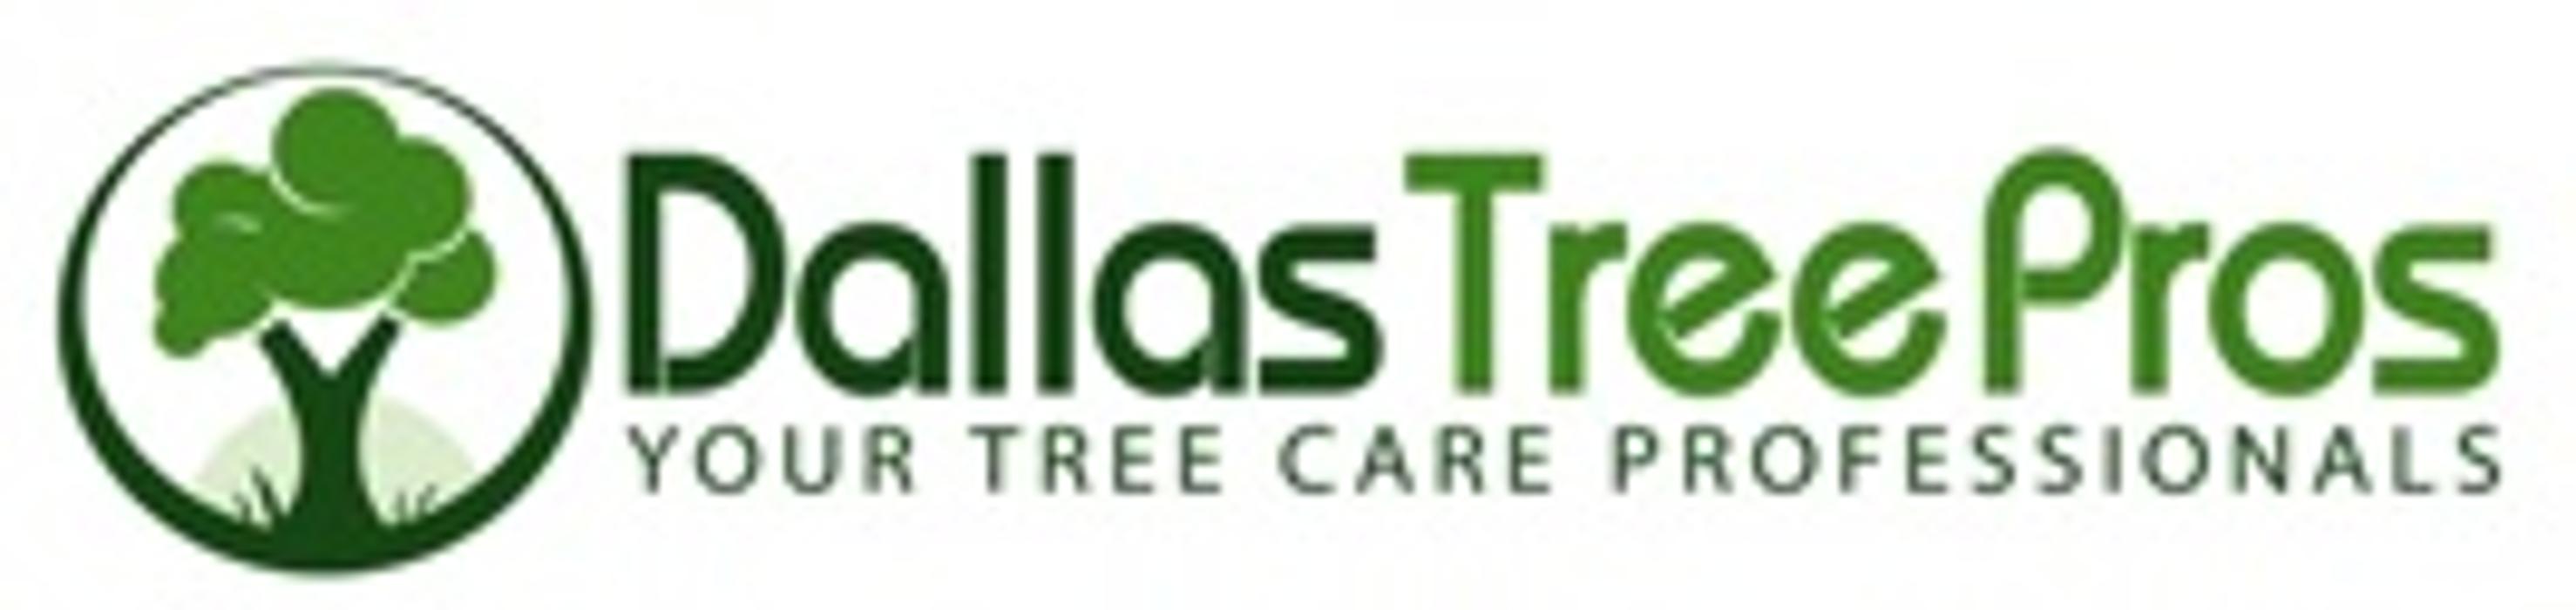 Dallas Tree Pros - Dallas, TX